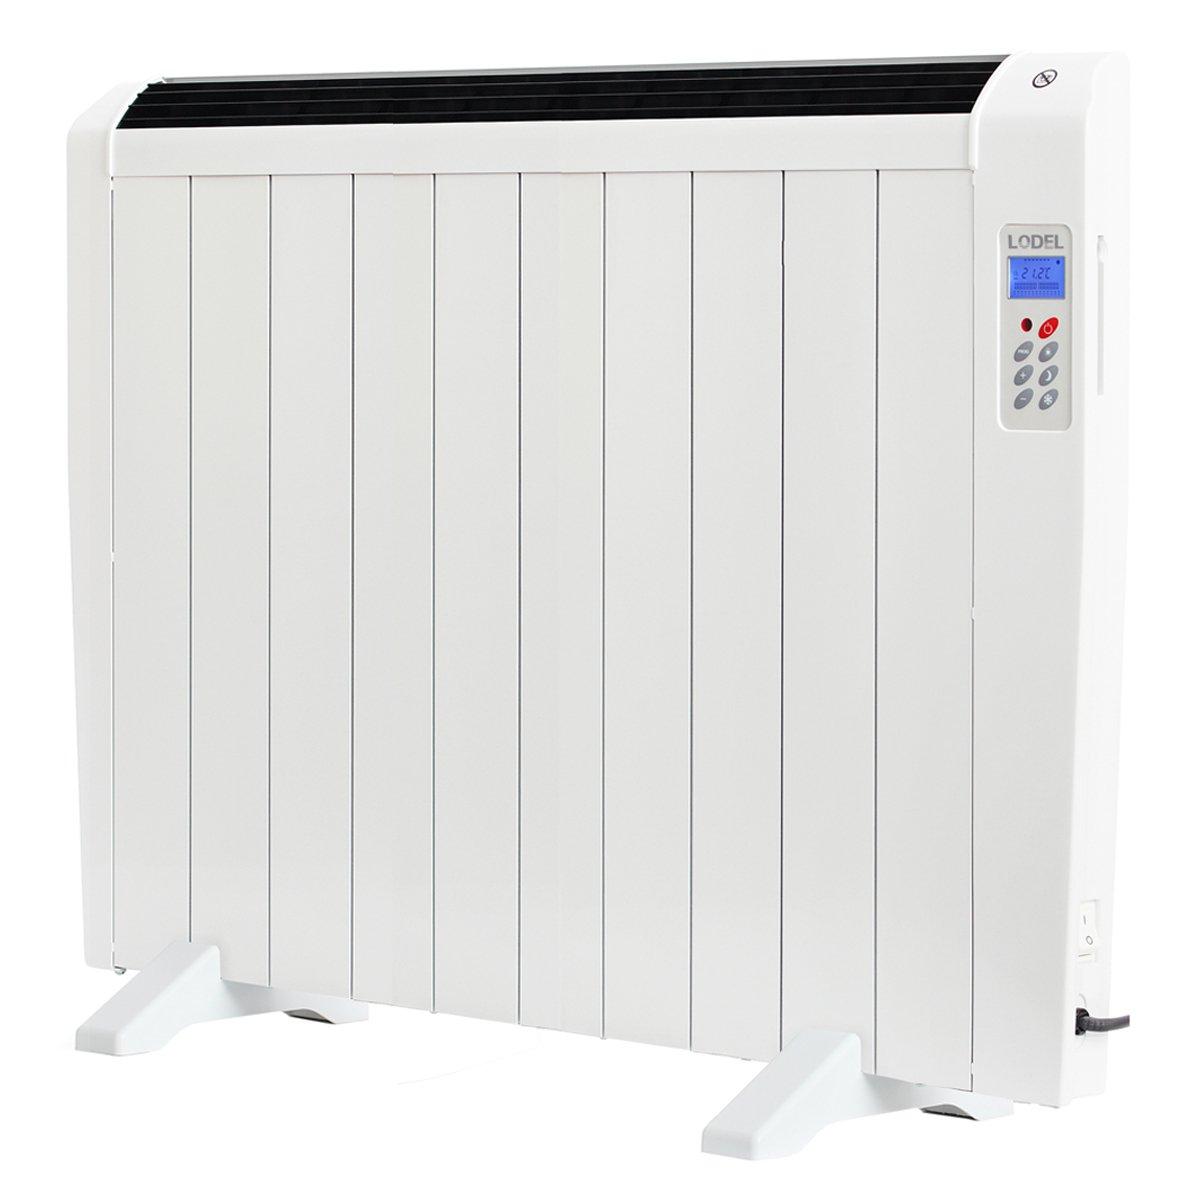 Lodel RA-10 - Emisor térmico digital programable seco, 1500 W, 220-